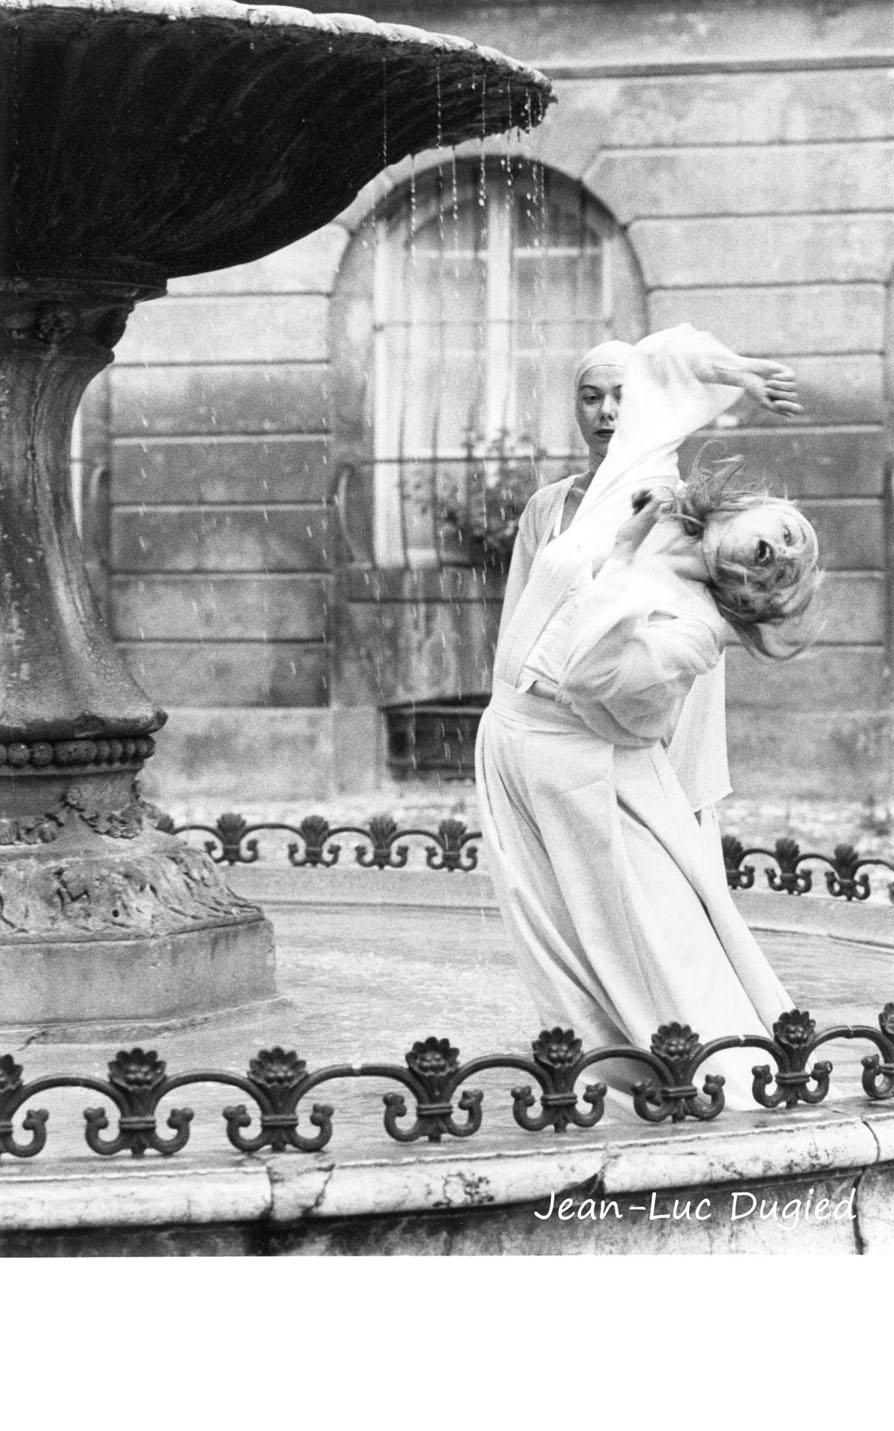 8 Hernu Nadine - accoules avec Christine van Maerrem - 1988